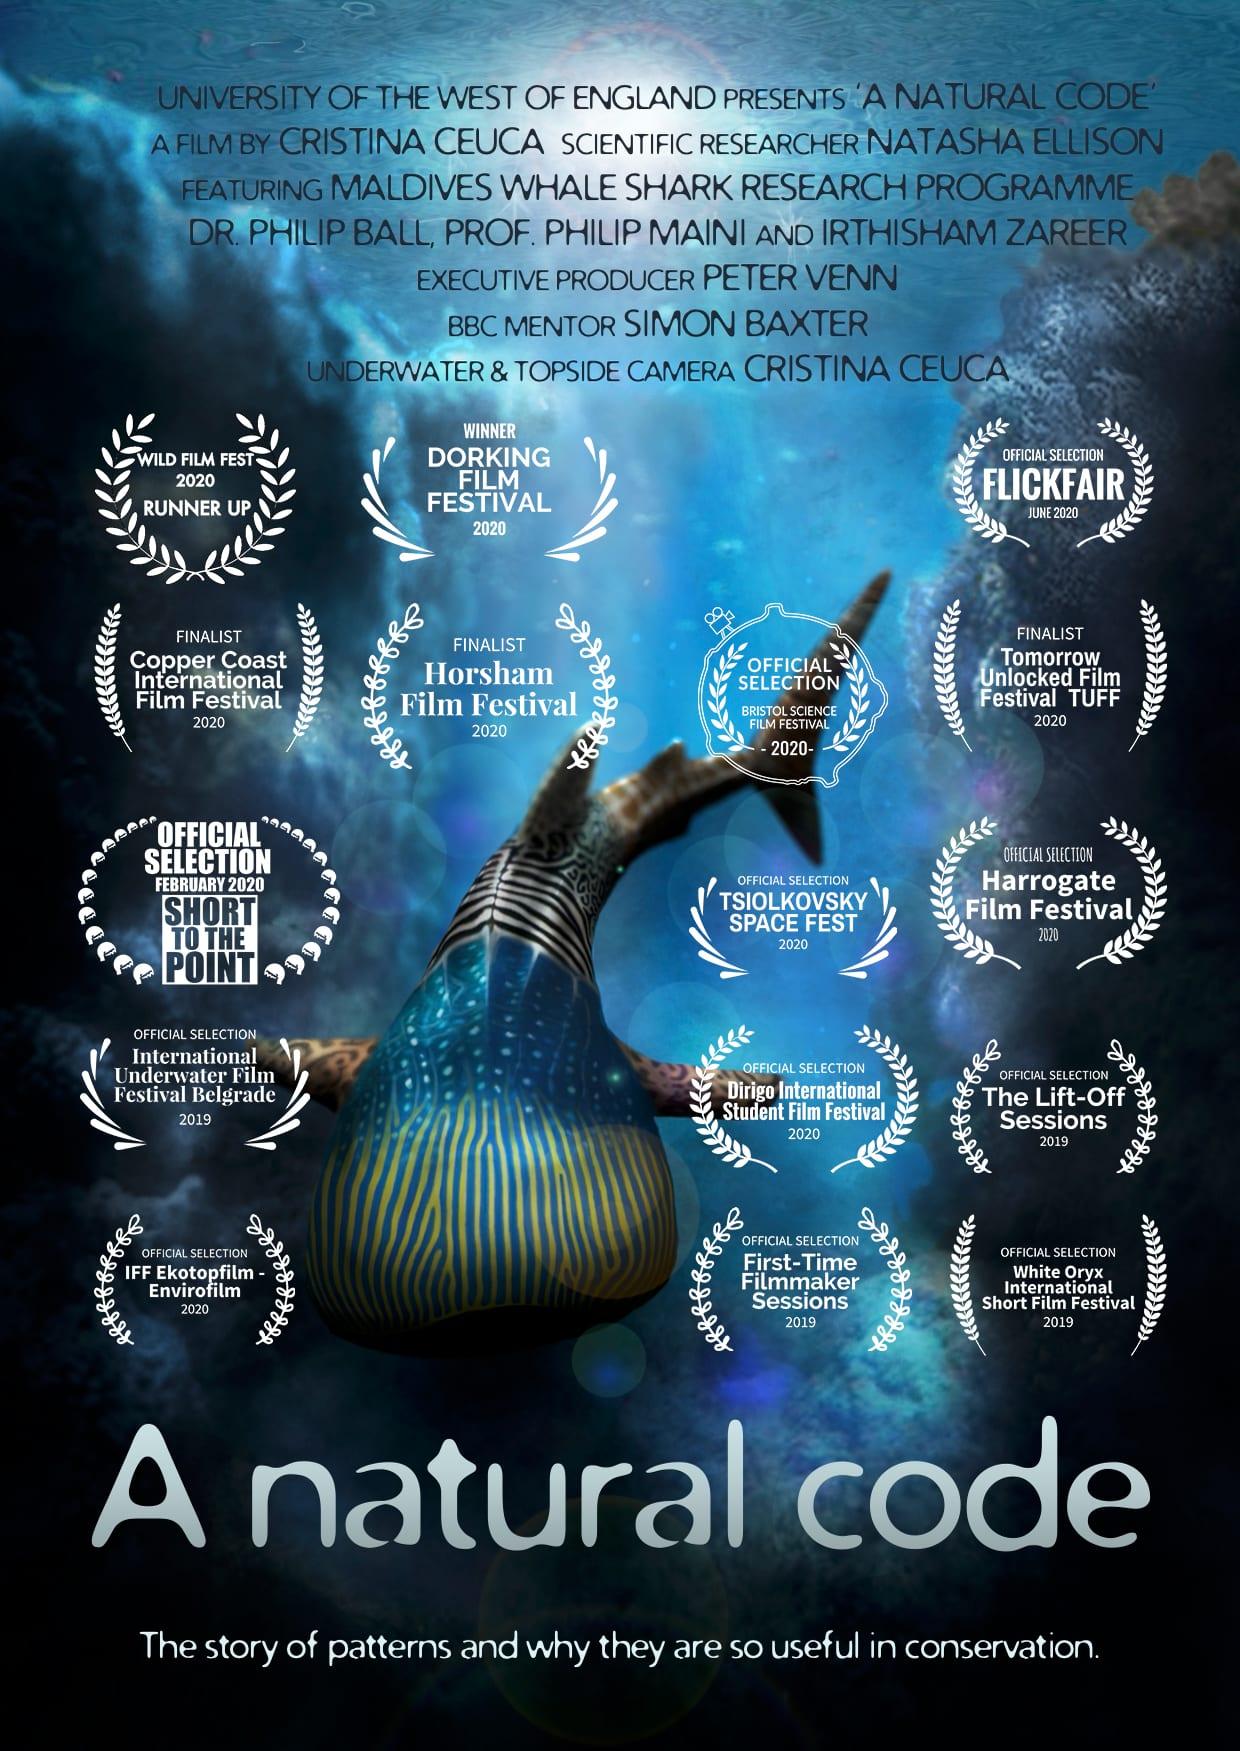 A natural code film poster